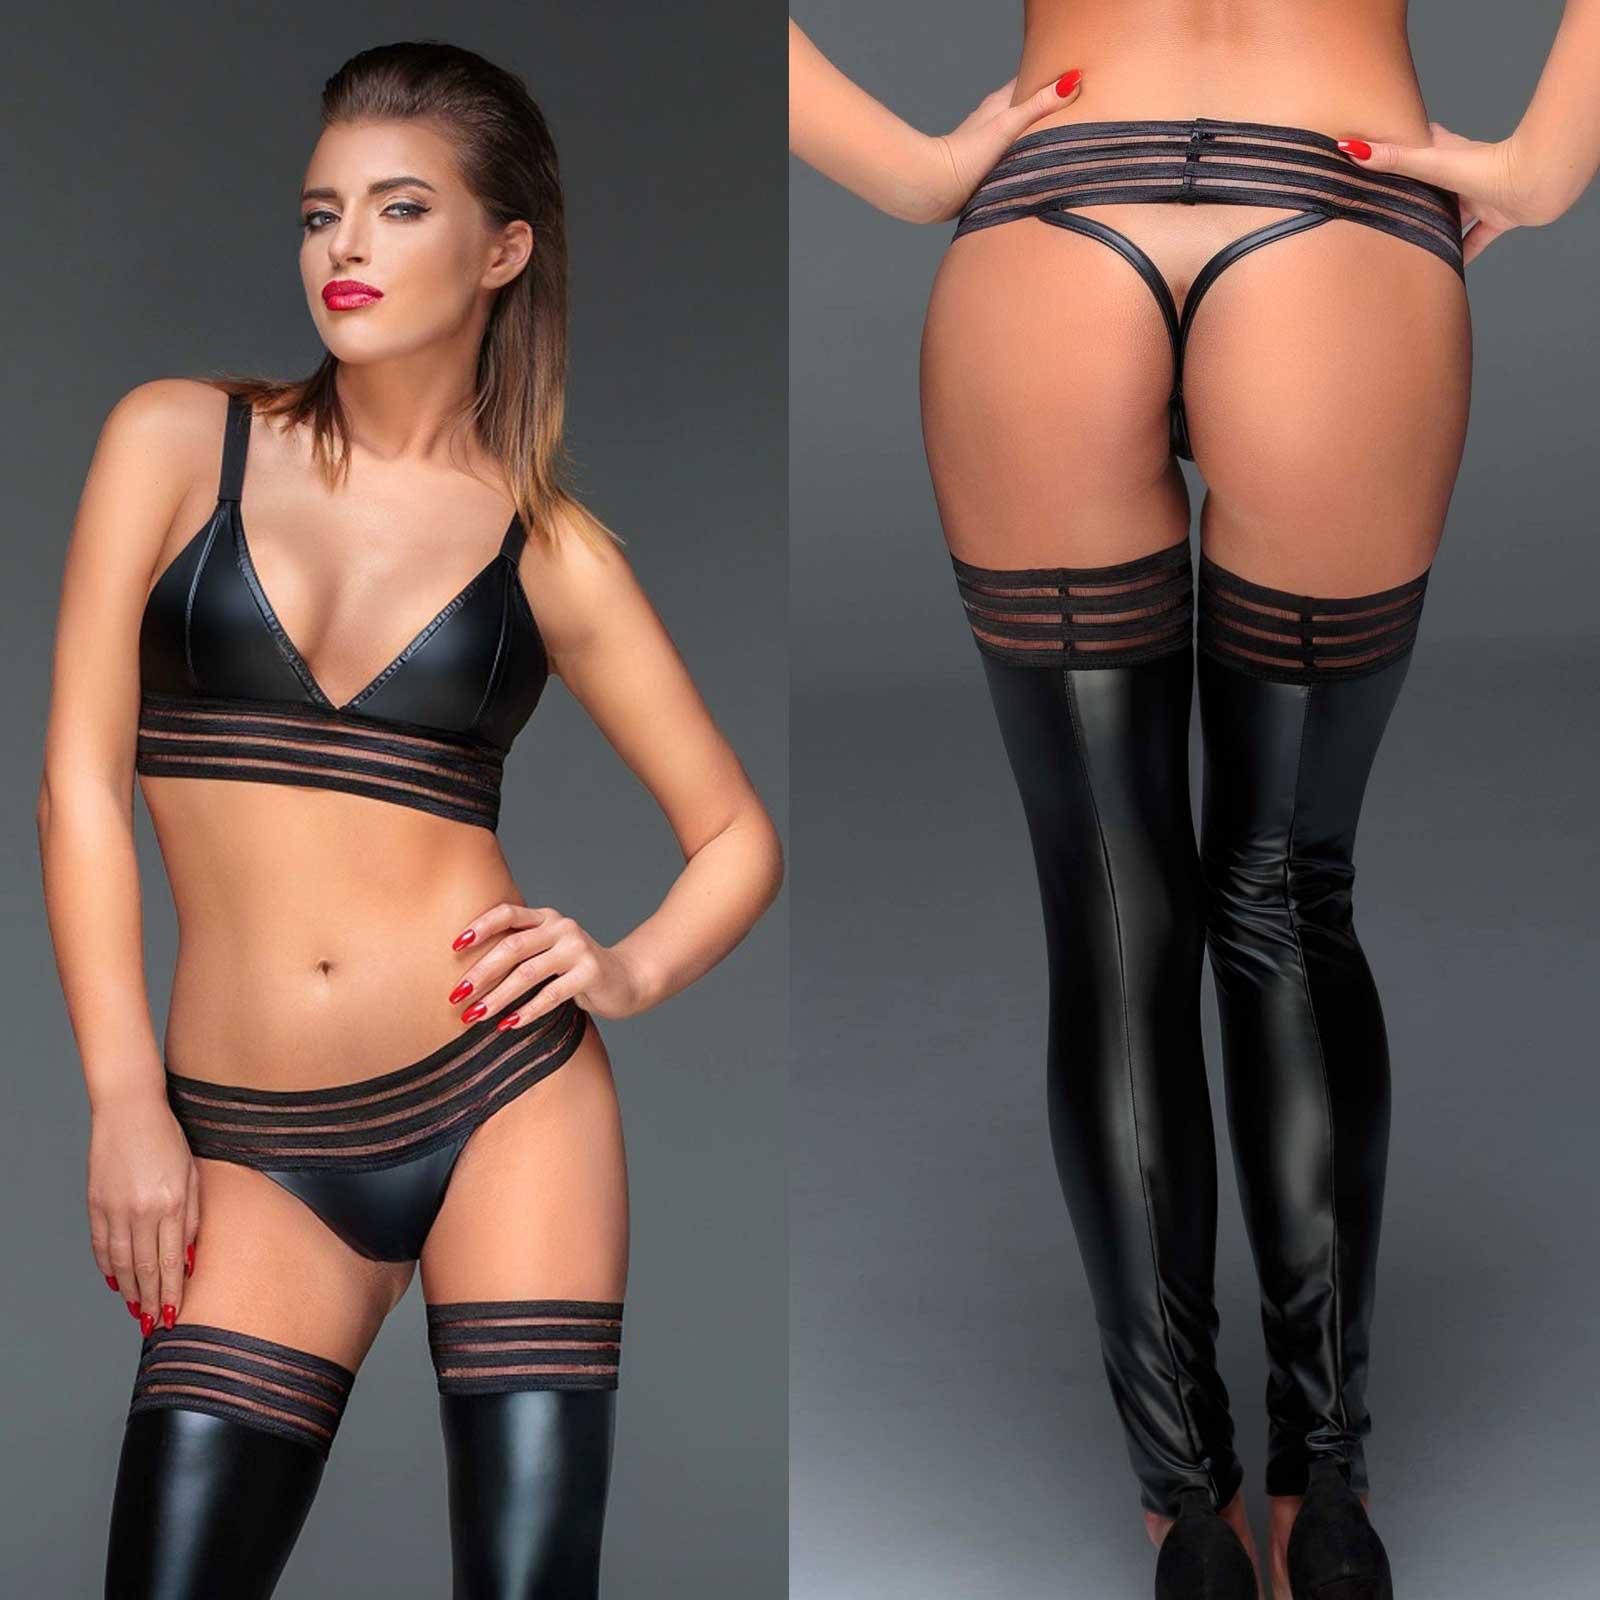 NOIR HANDMADE Powerstripe String Panty